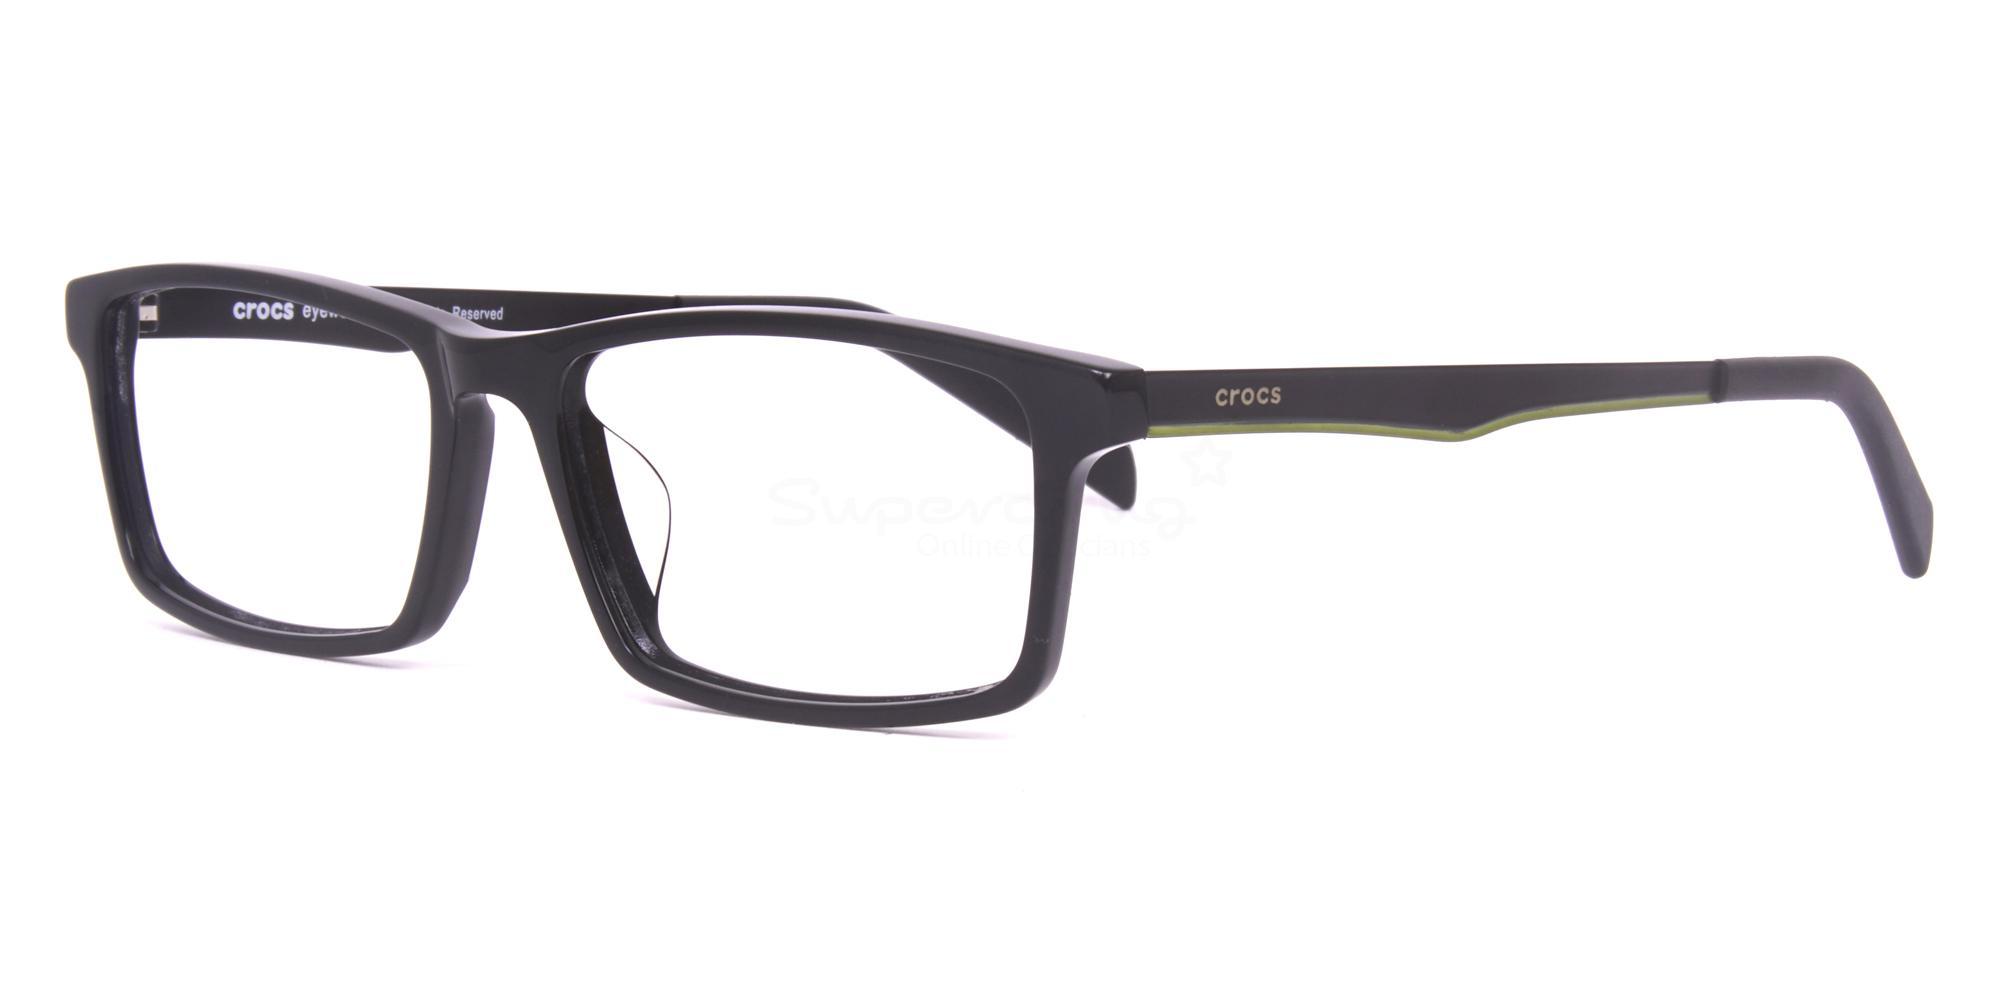 20BK CF4320 Glasses, Crocs Eyewear